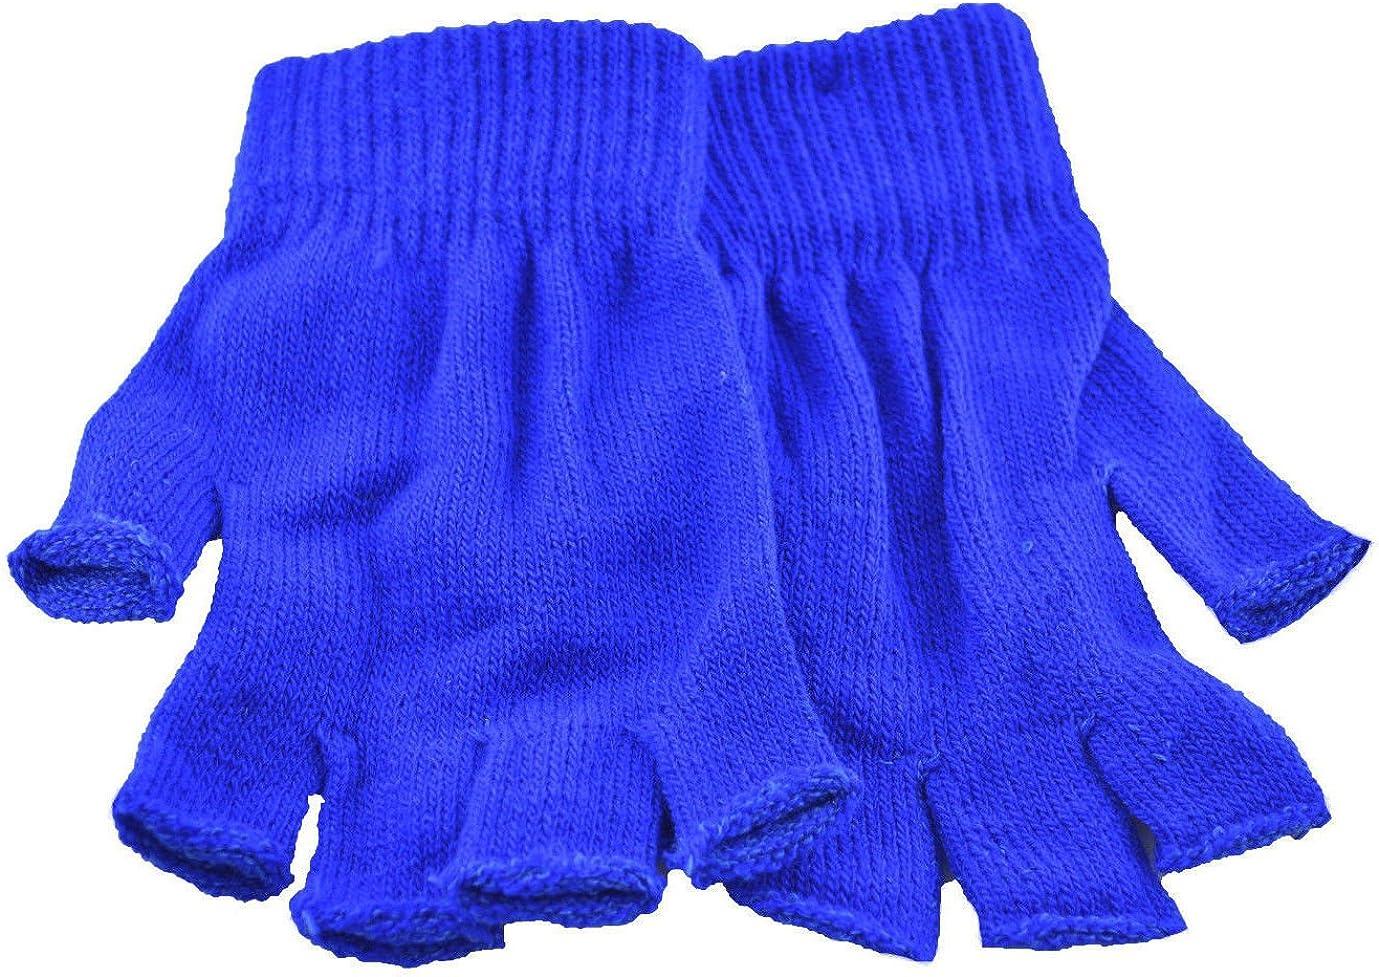 Nayt Fingerless Glove Blue Boston Mall Royal Industry No. 1